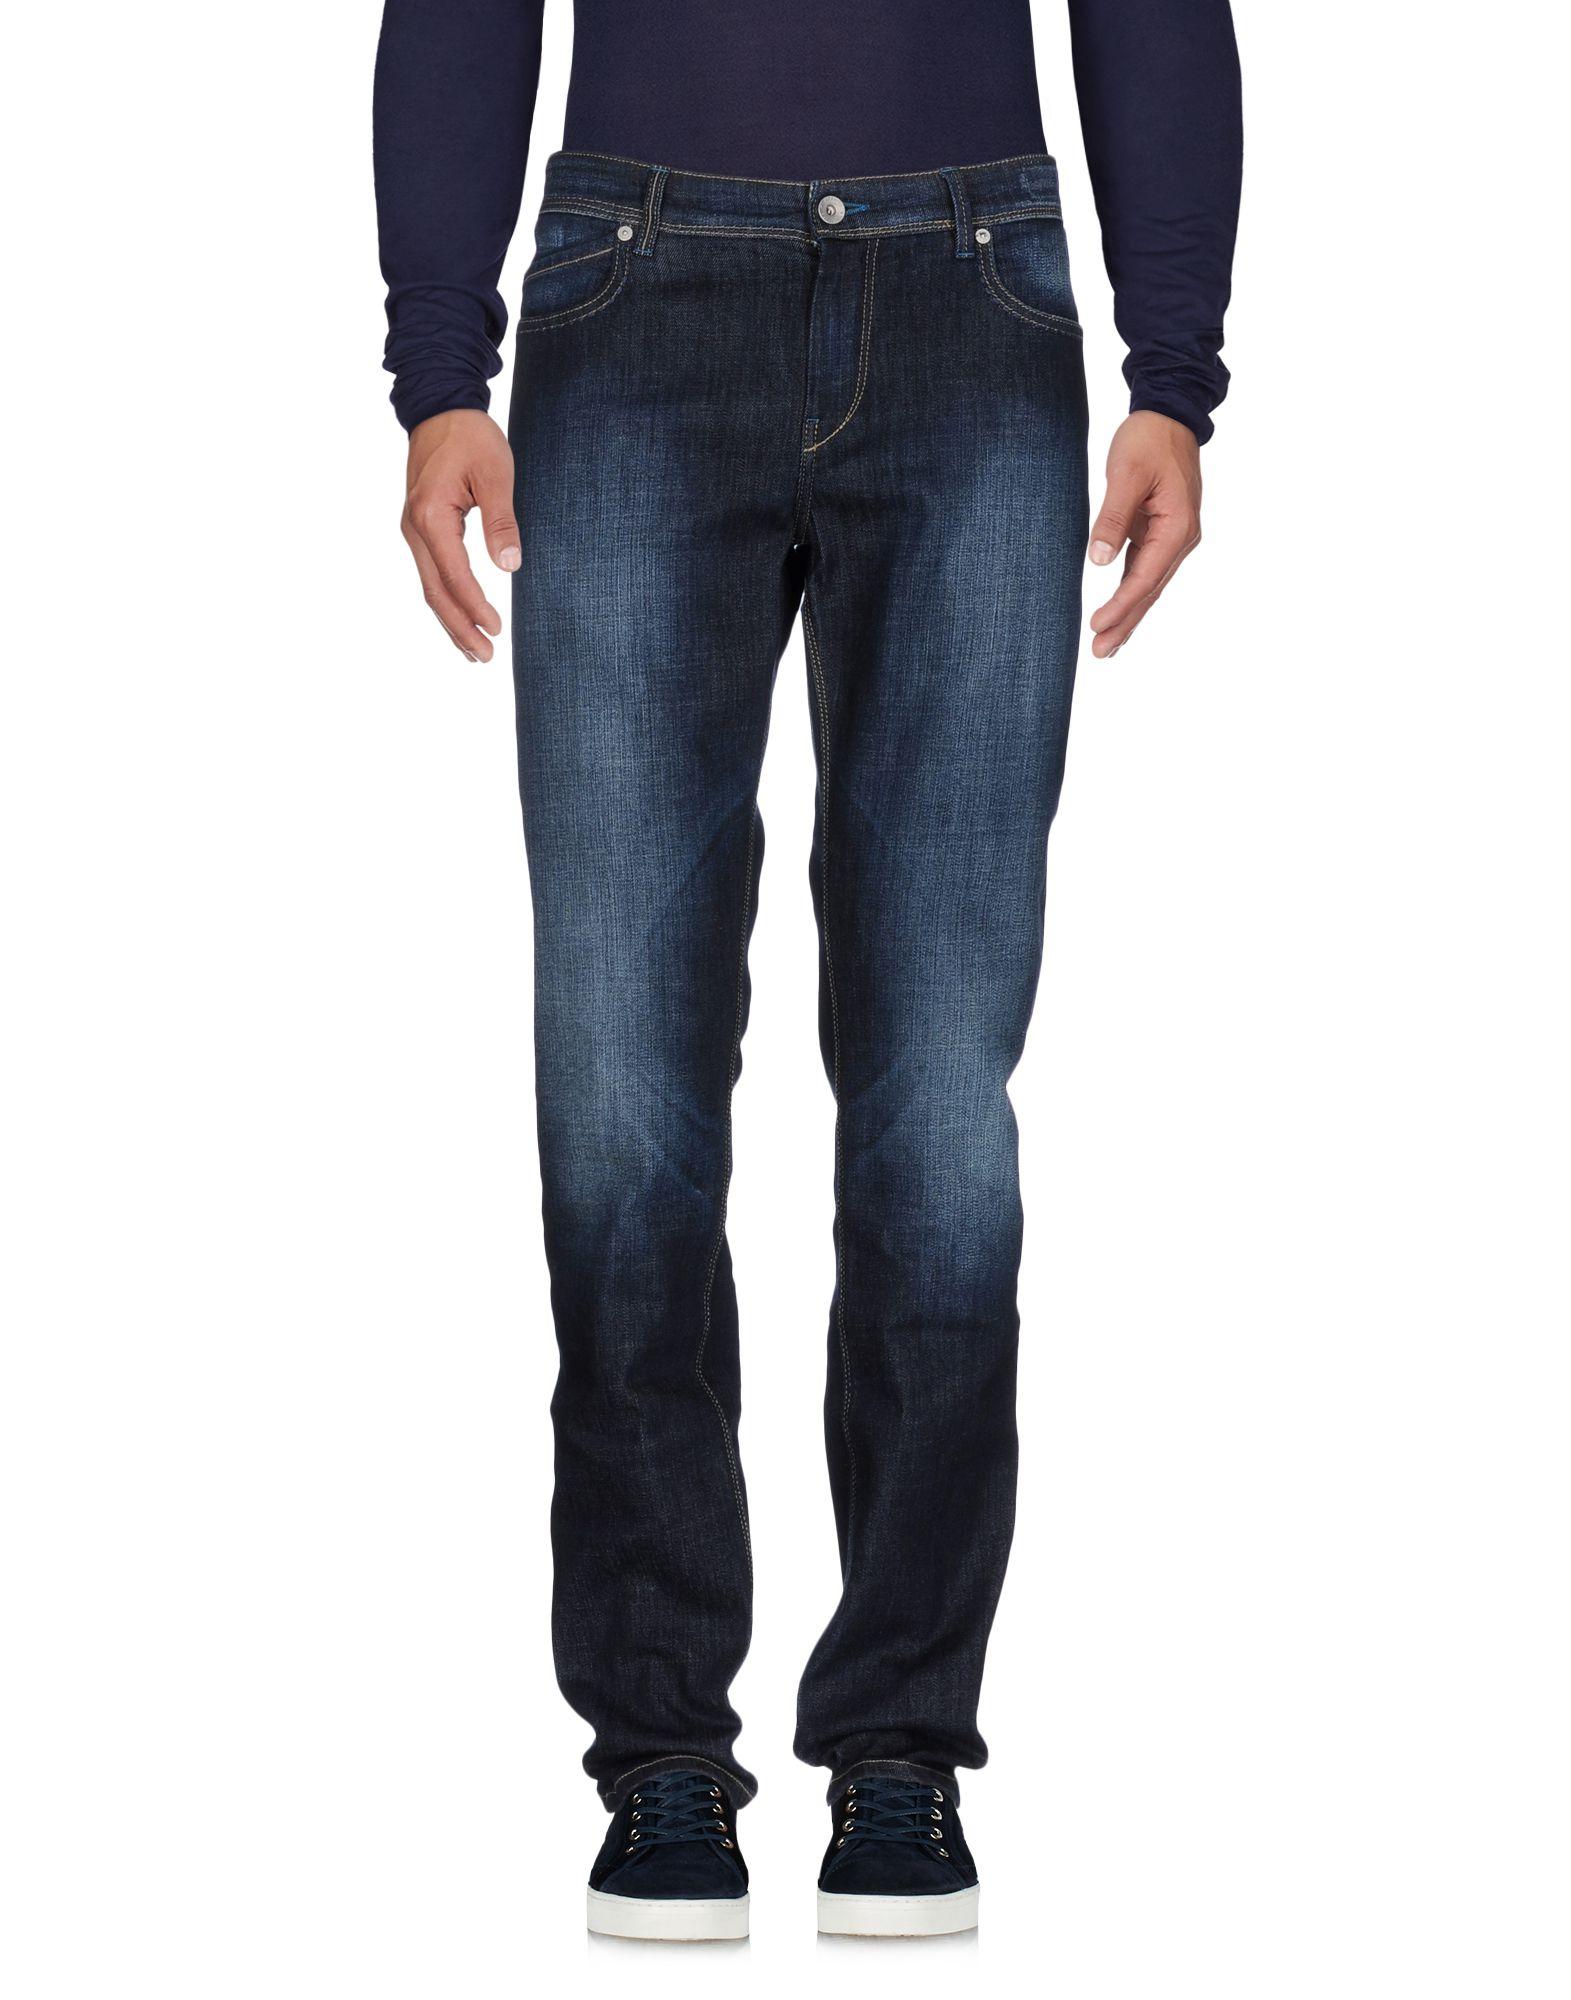 RE-HASH Herren Jeanshose Farbe Blau Größe 10 - broschei